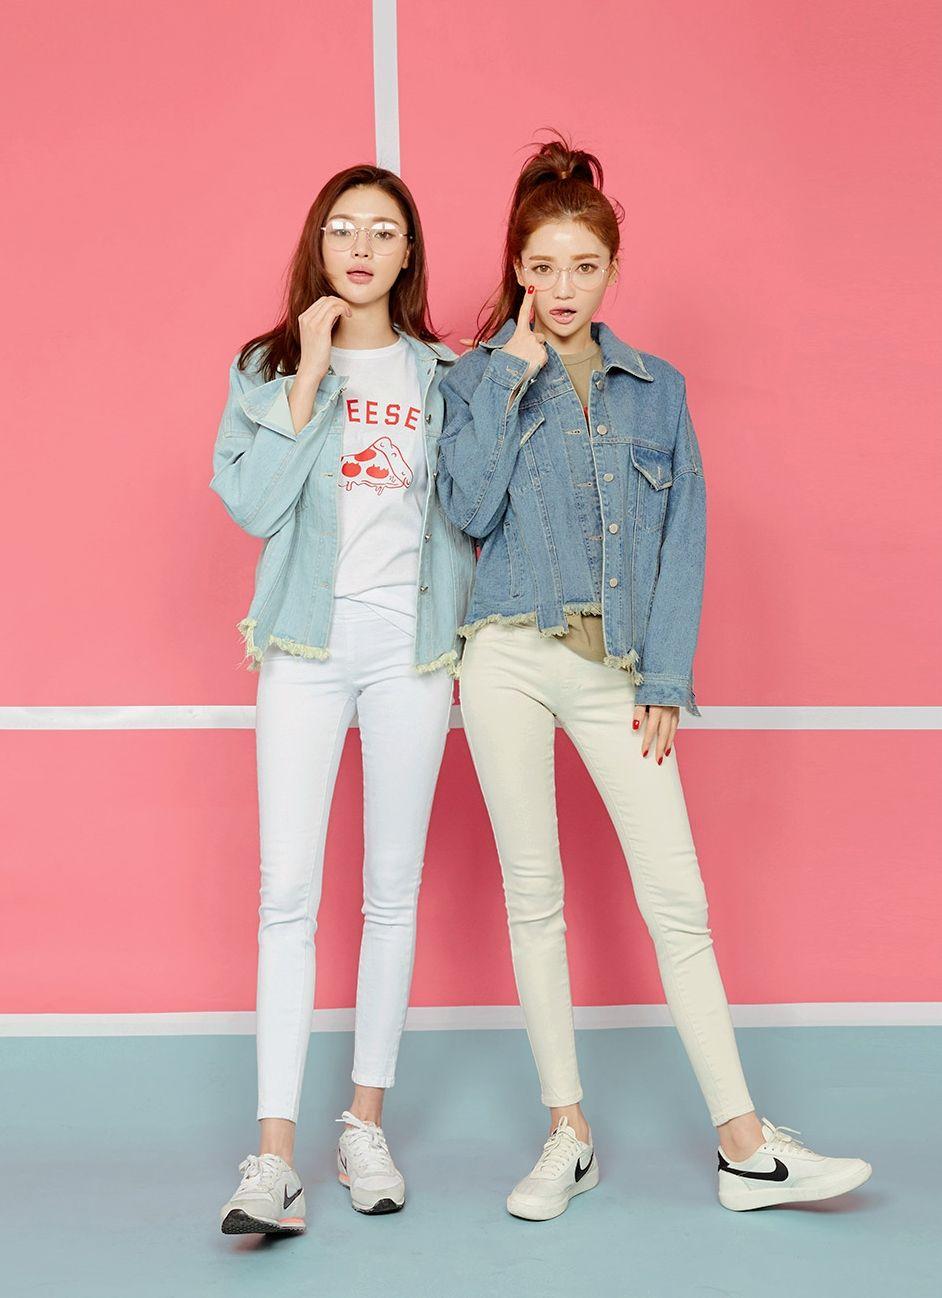 #korean, #fashion, #ootd, #denim, #Look